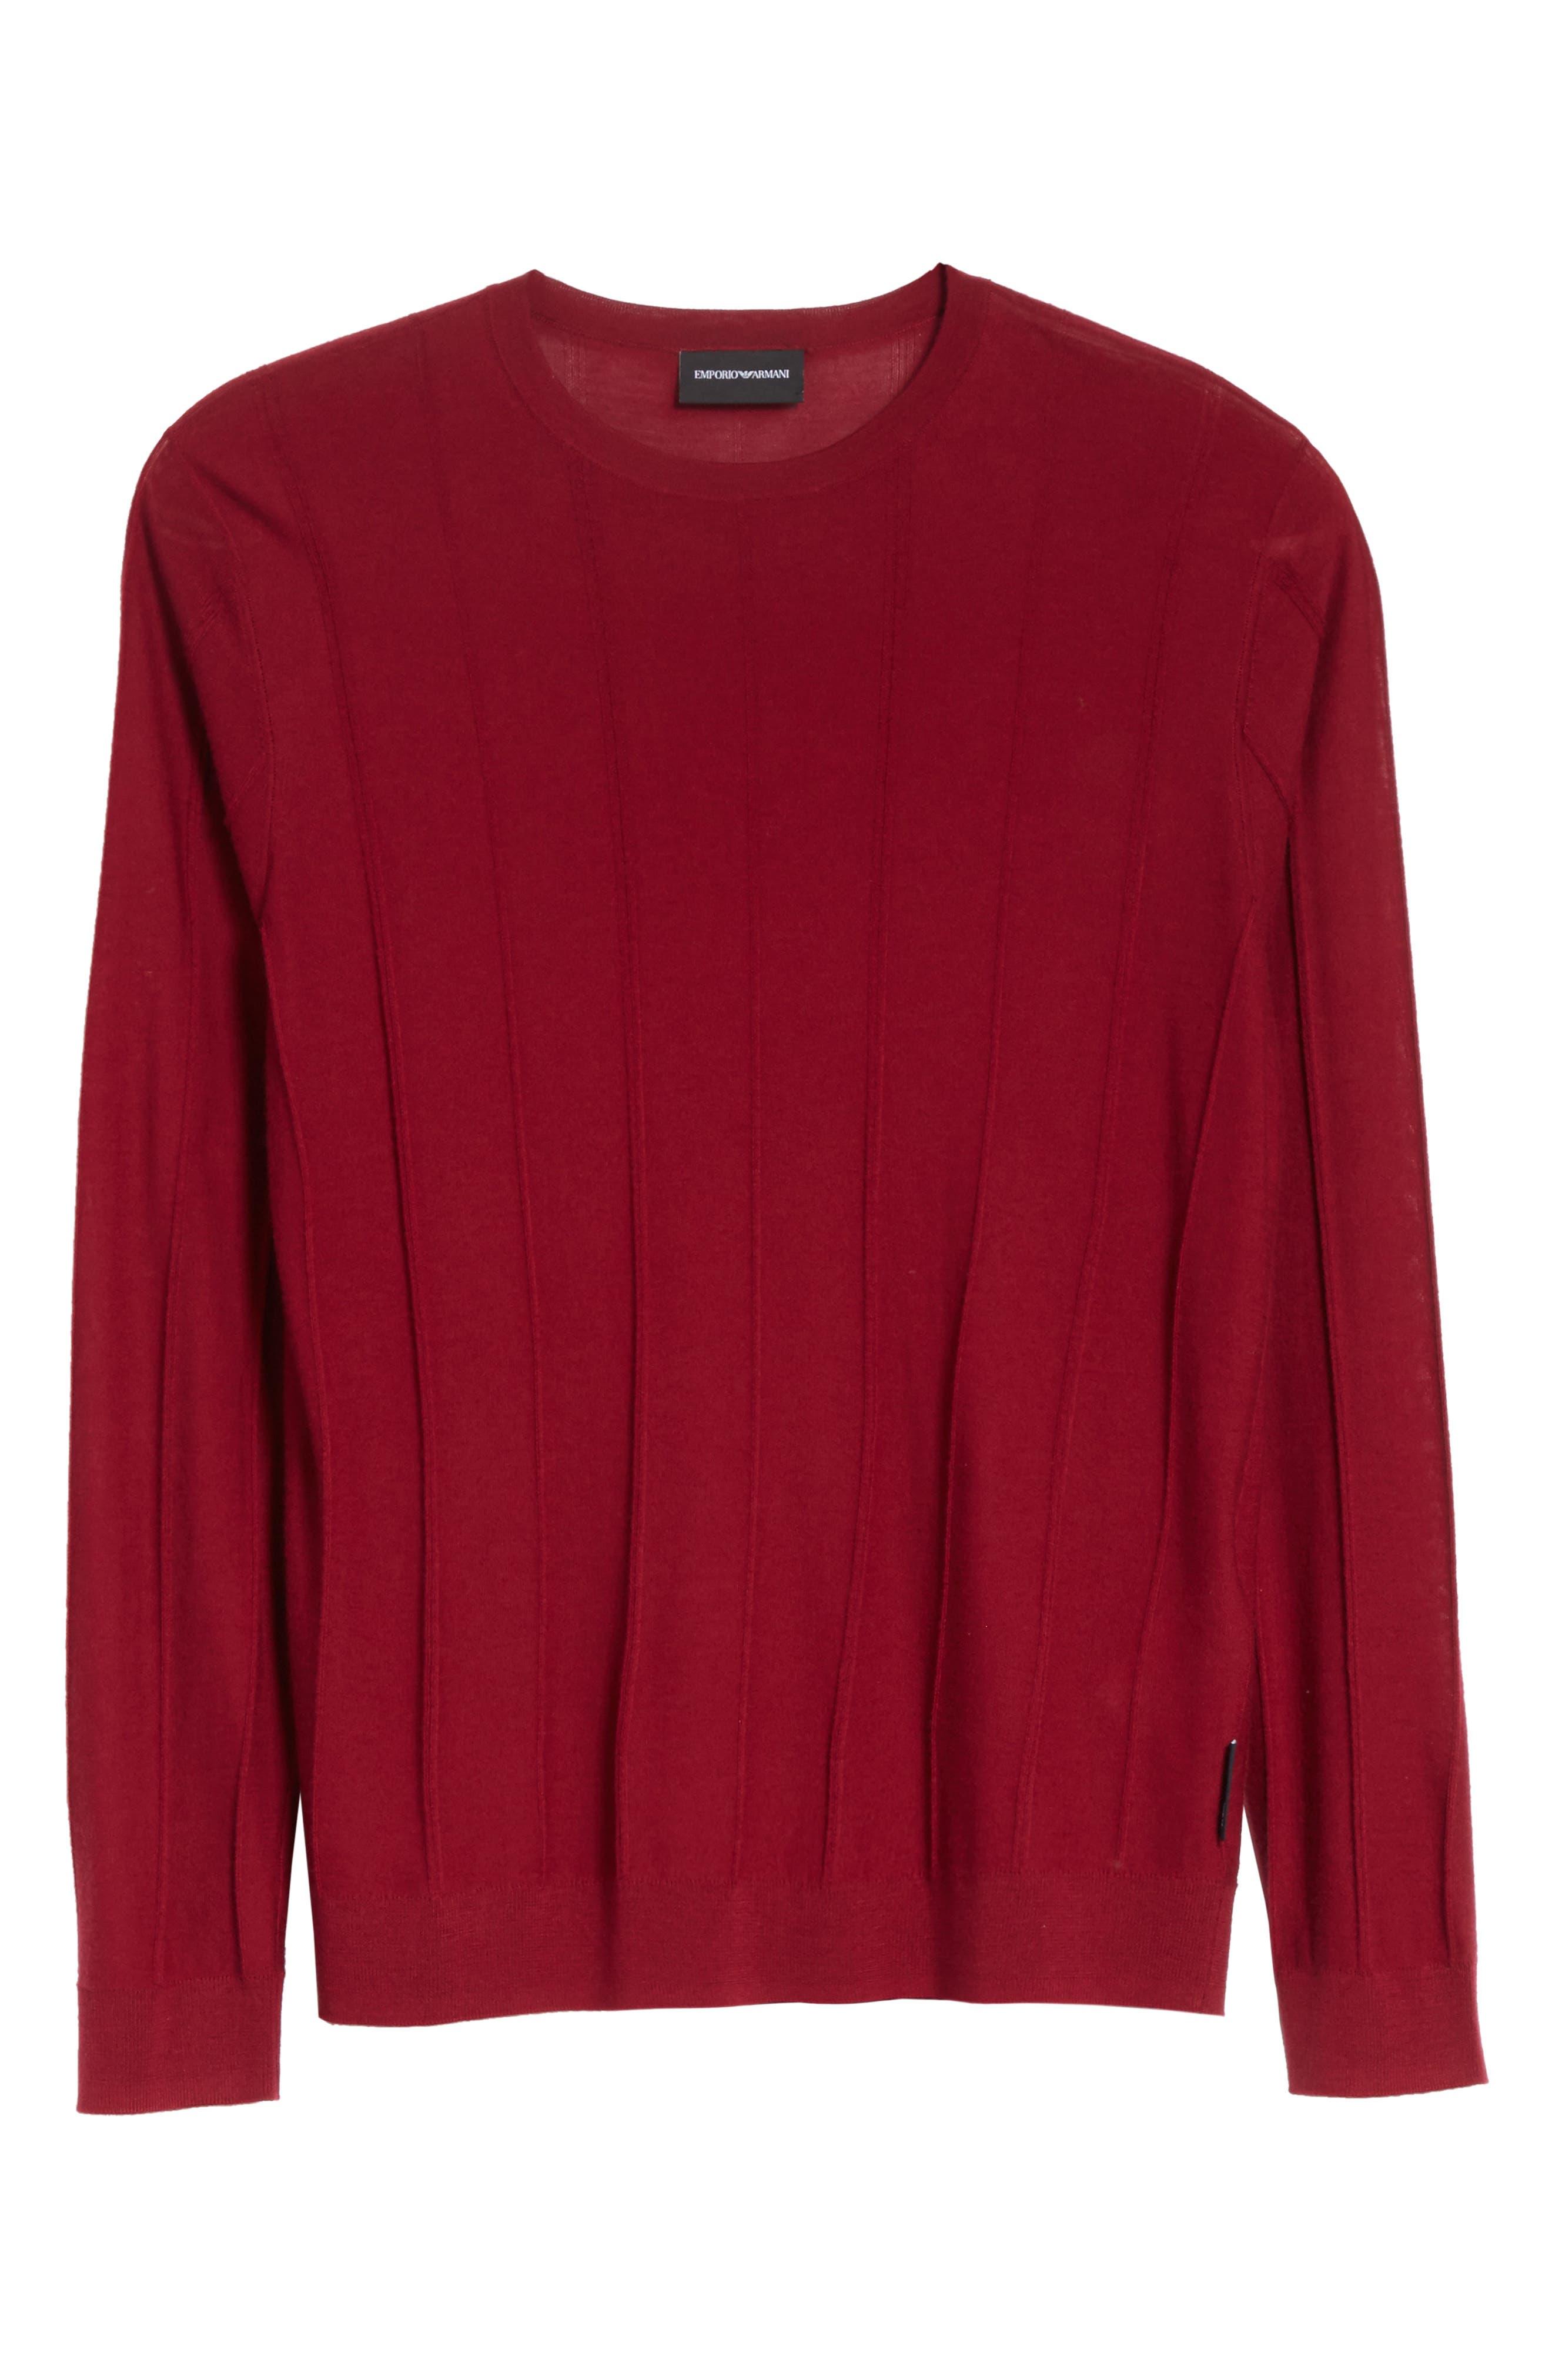 Slim Fit Wool Crewneck Sweater,                             Alternate thumbnail 6, color,                             Borgogna